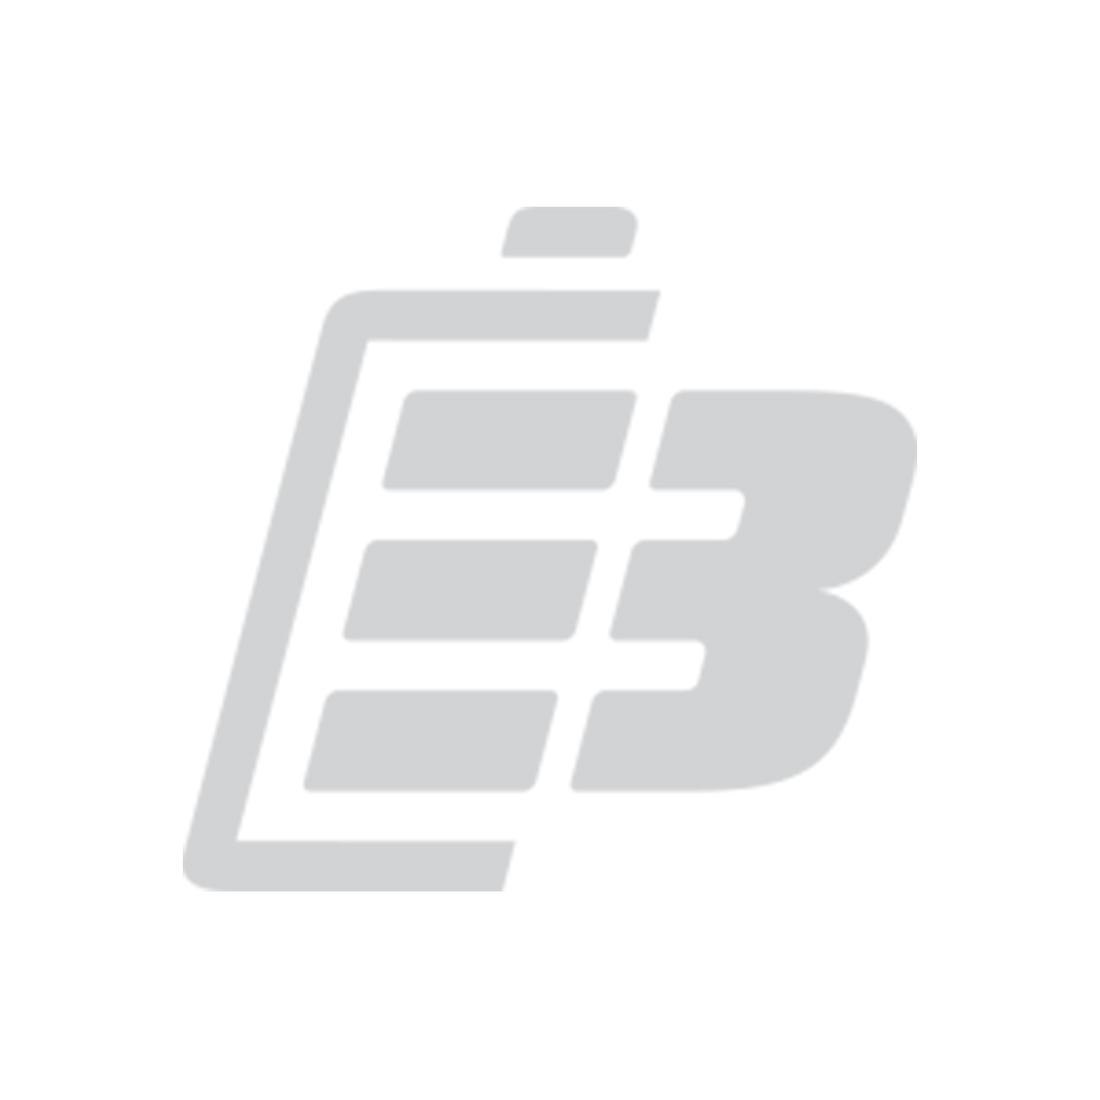 Smartphone battery ZTE Blade L3_1